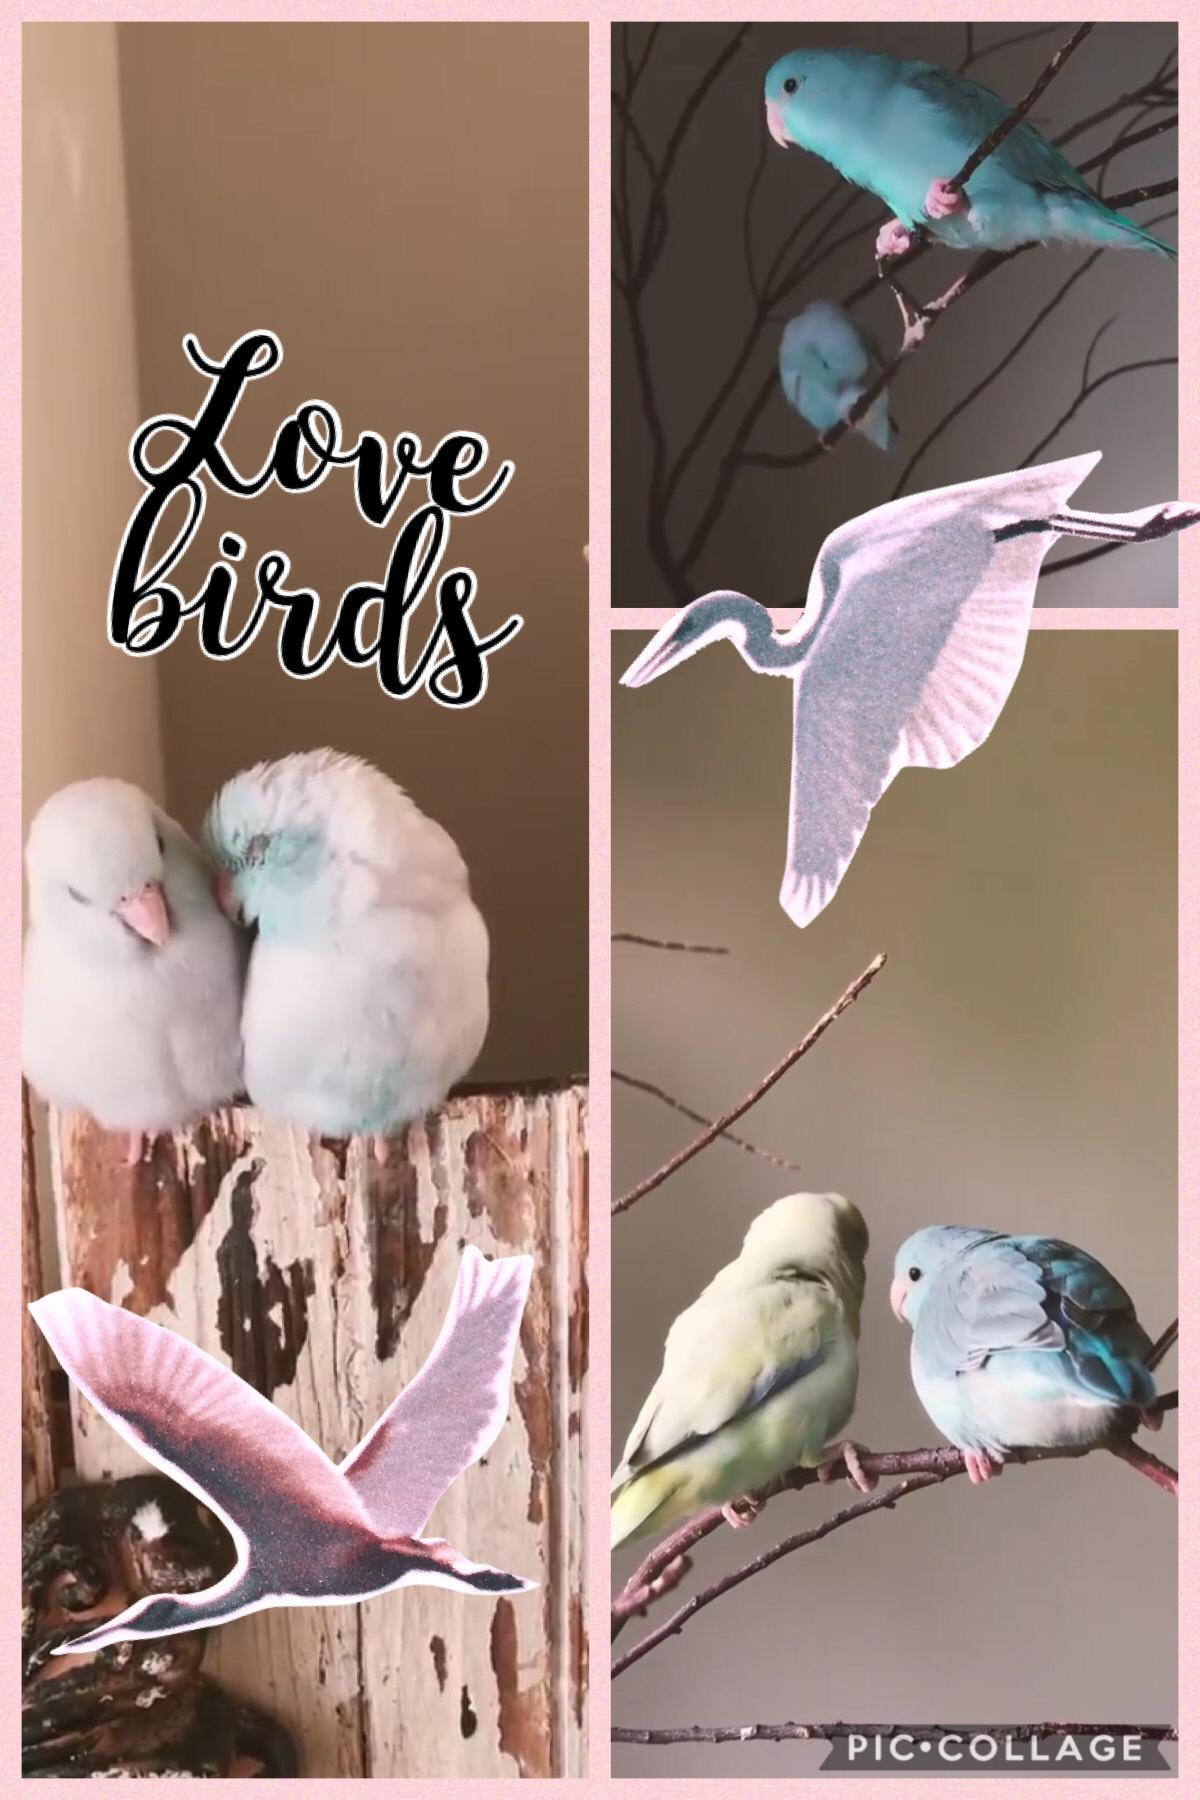 Birds are so cute